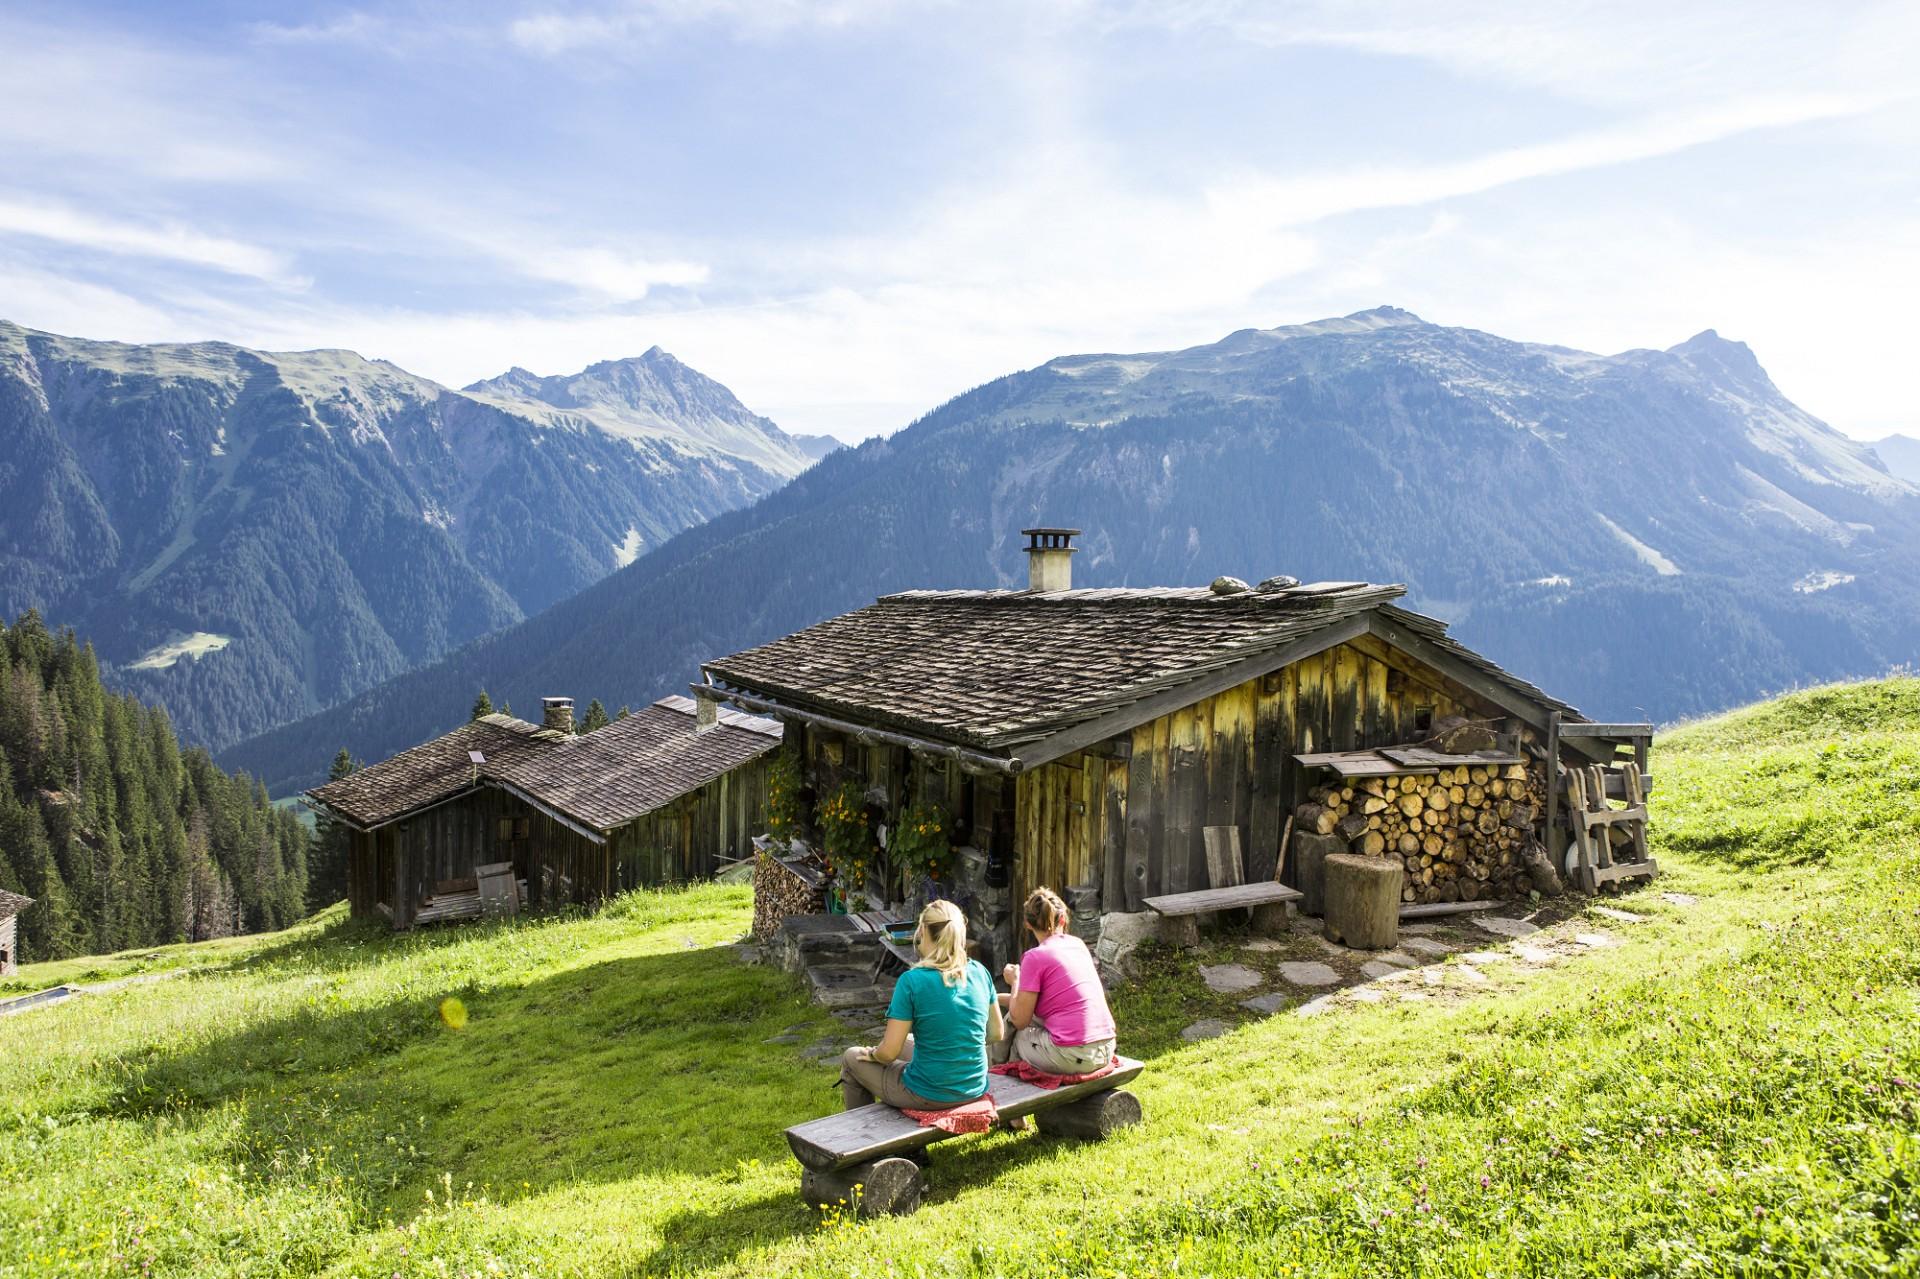 Wandern in Gaschurn (c) Daniel Zangerl - Montafon Tourismus GmbH, Schruns